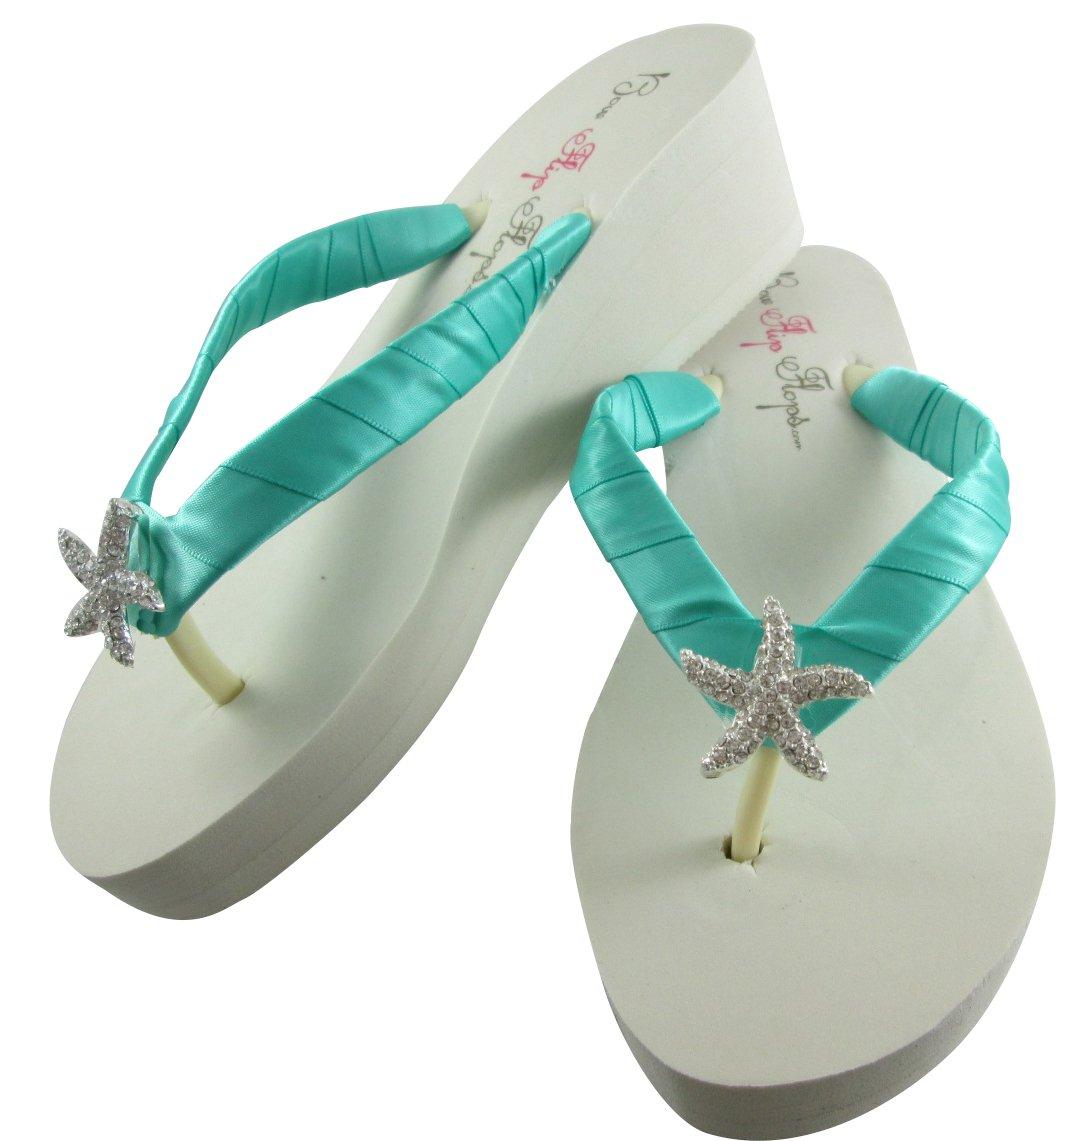 Rhinestone Handmade ace embellished flip flop shoes